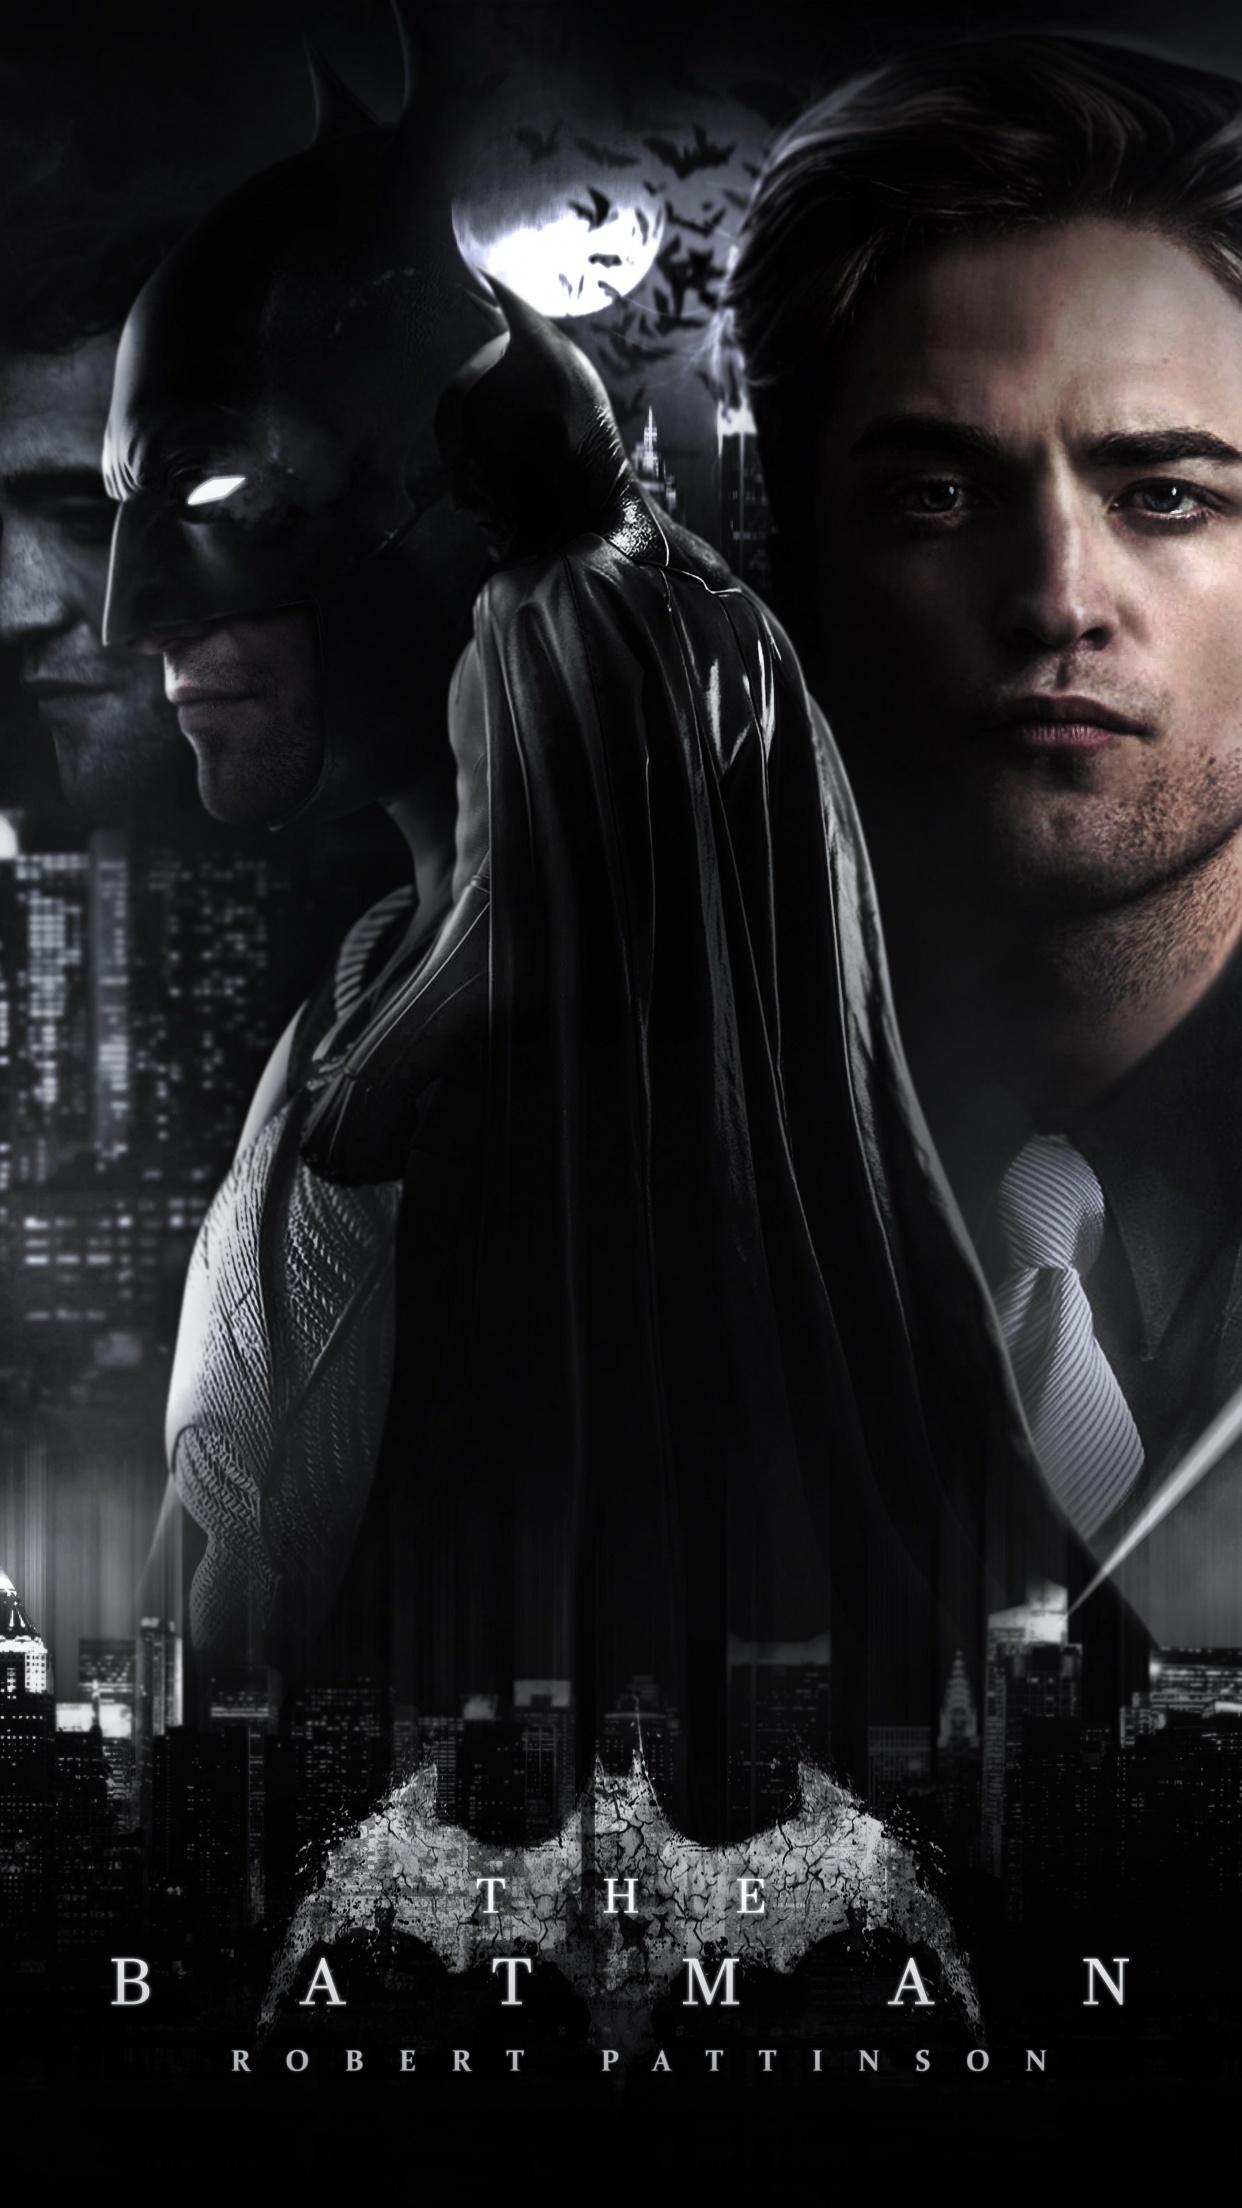 The Batman 4k Wallpaper Robert Pattinson 2021 Movies Dc Comics Movies 991